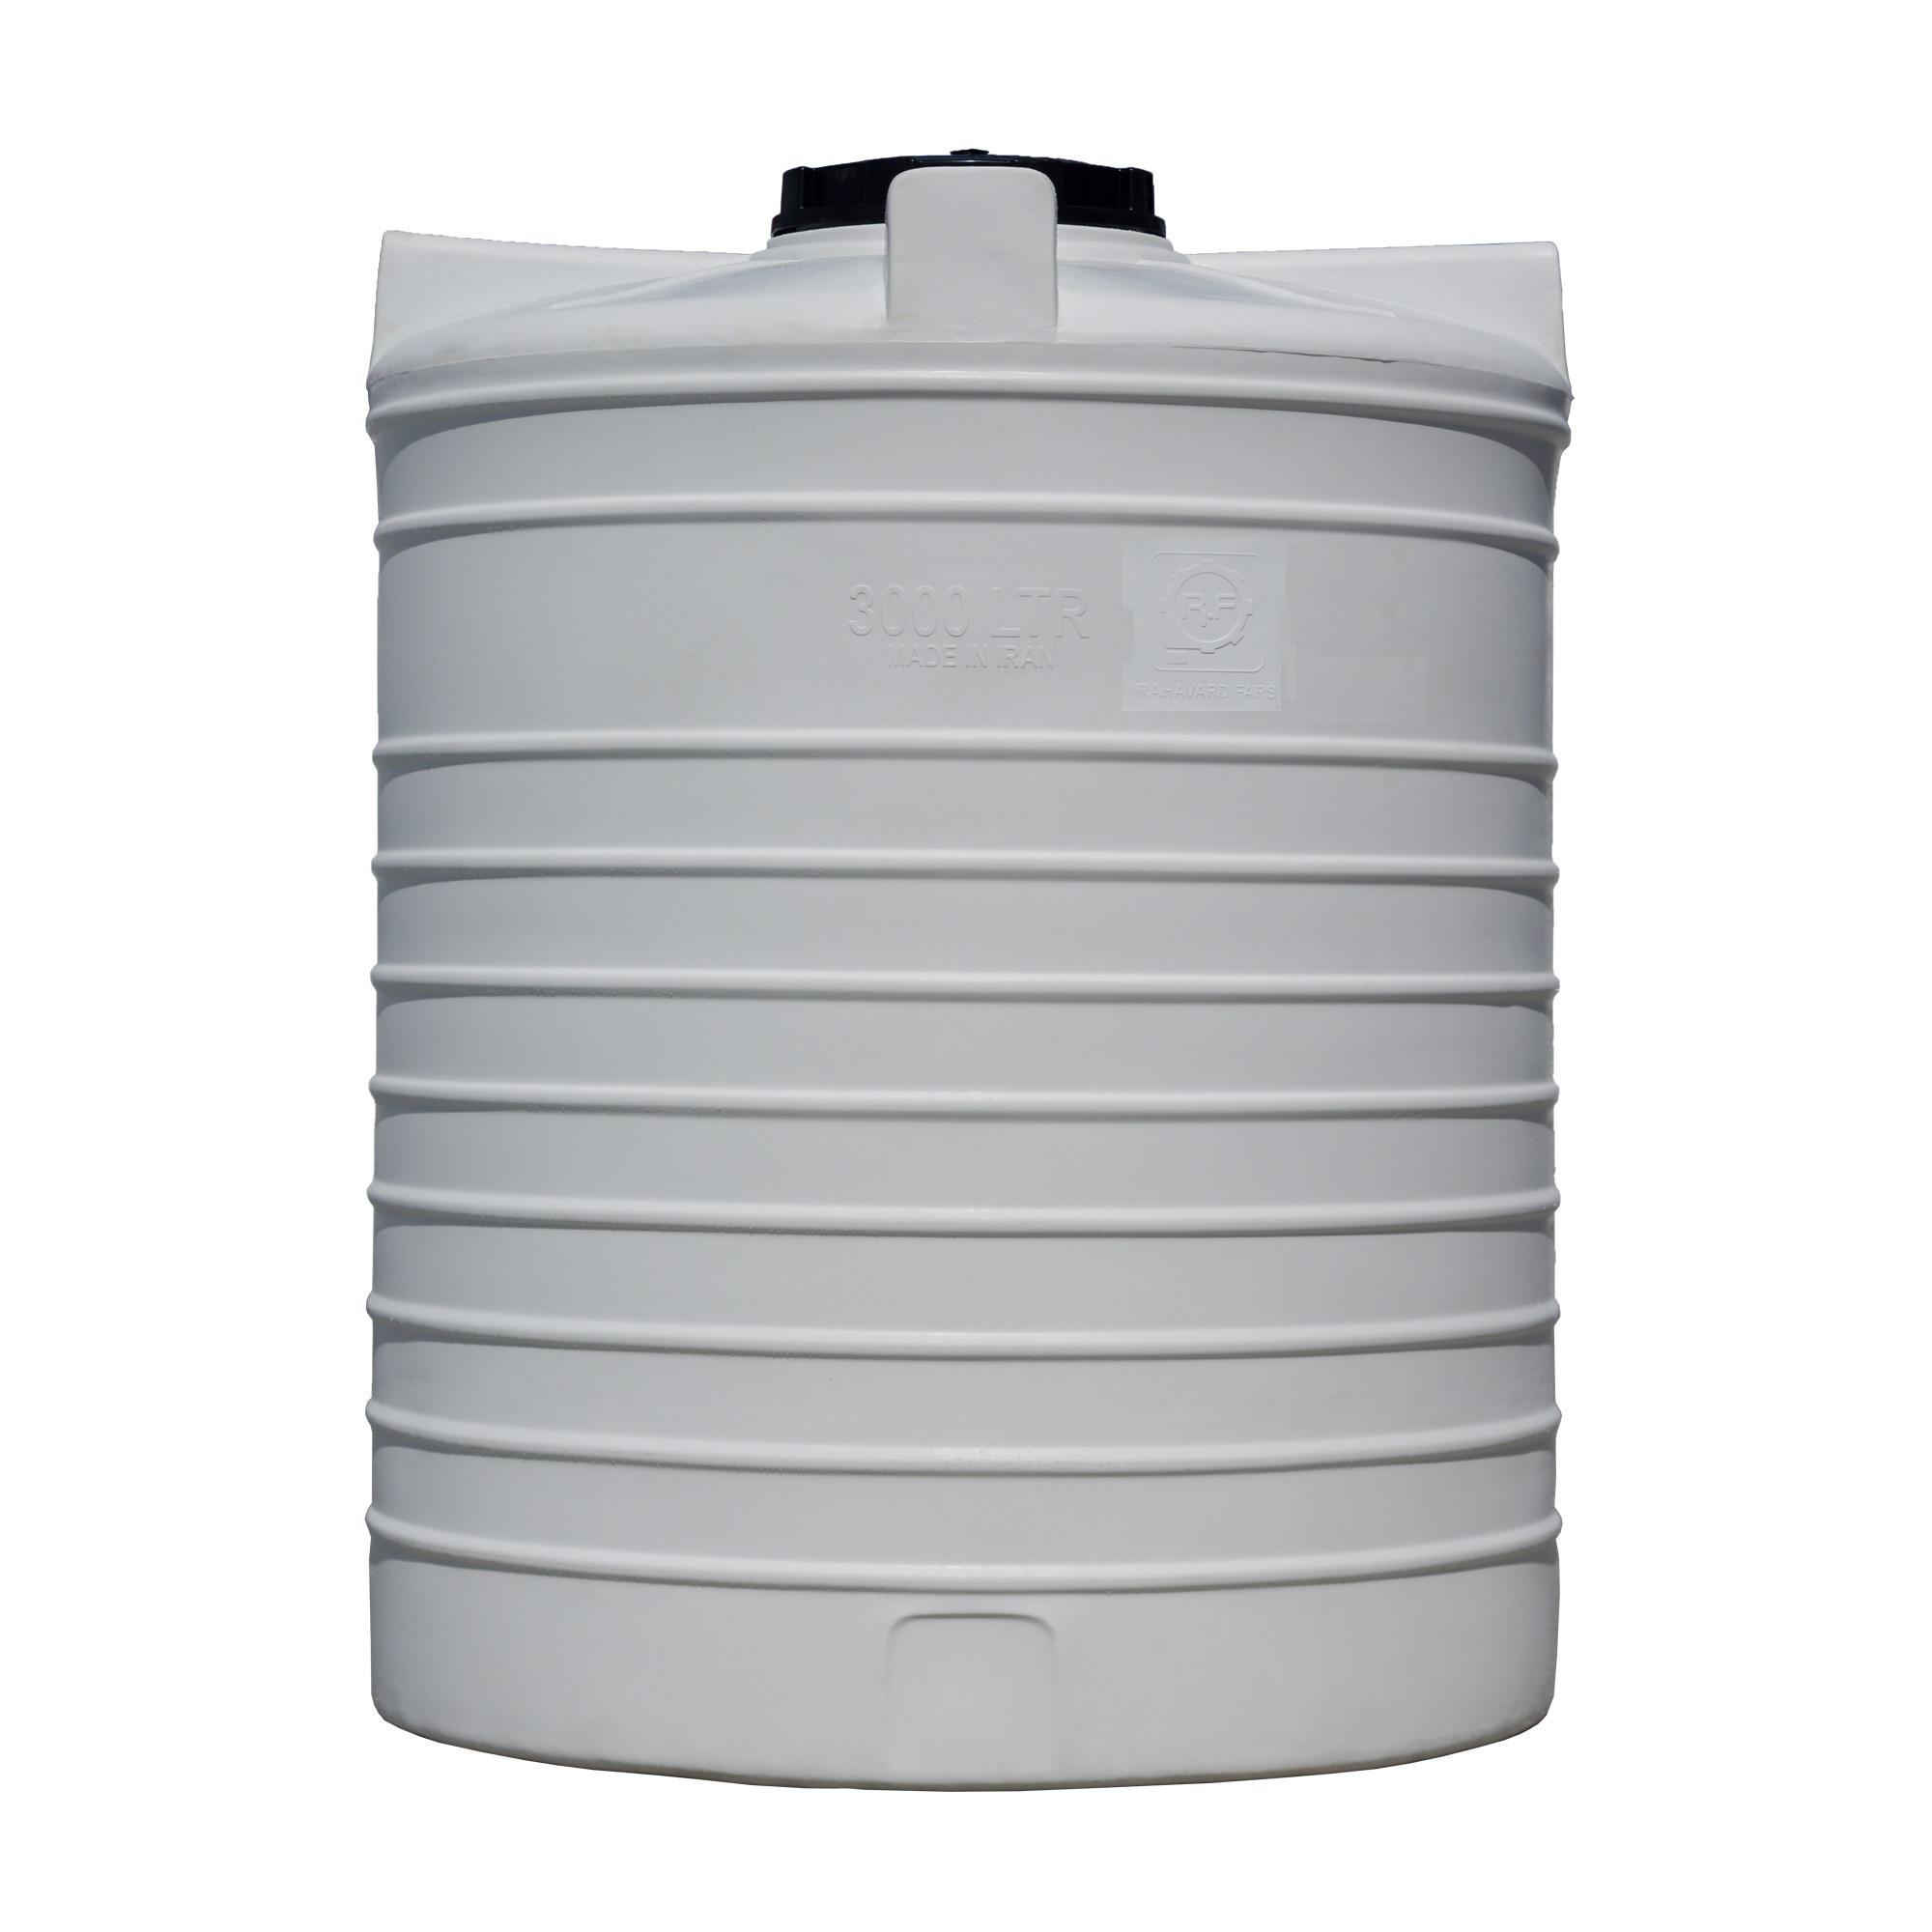 قیمت                                      مخزن آب رهاورد فارس کد 4886 حجم 3000 لیتر